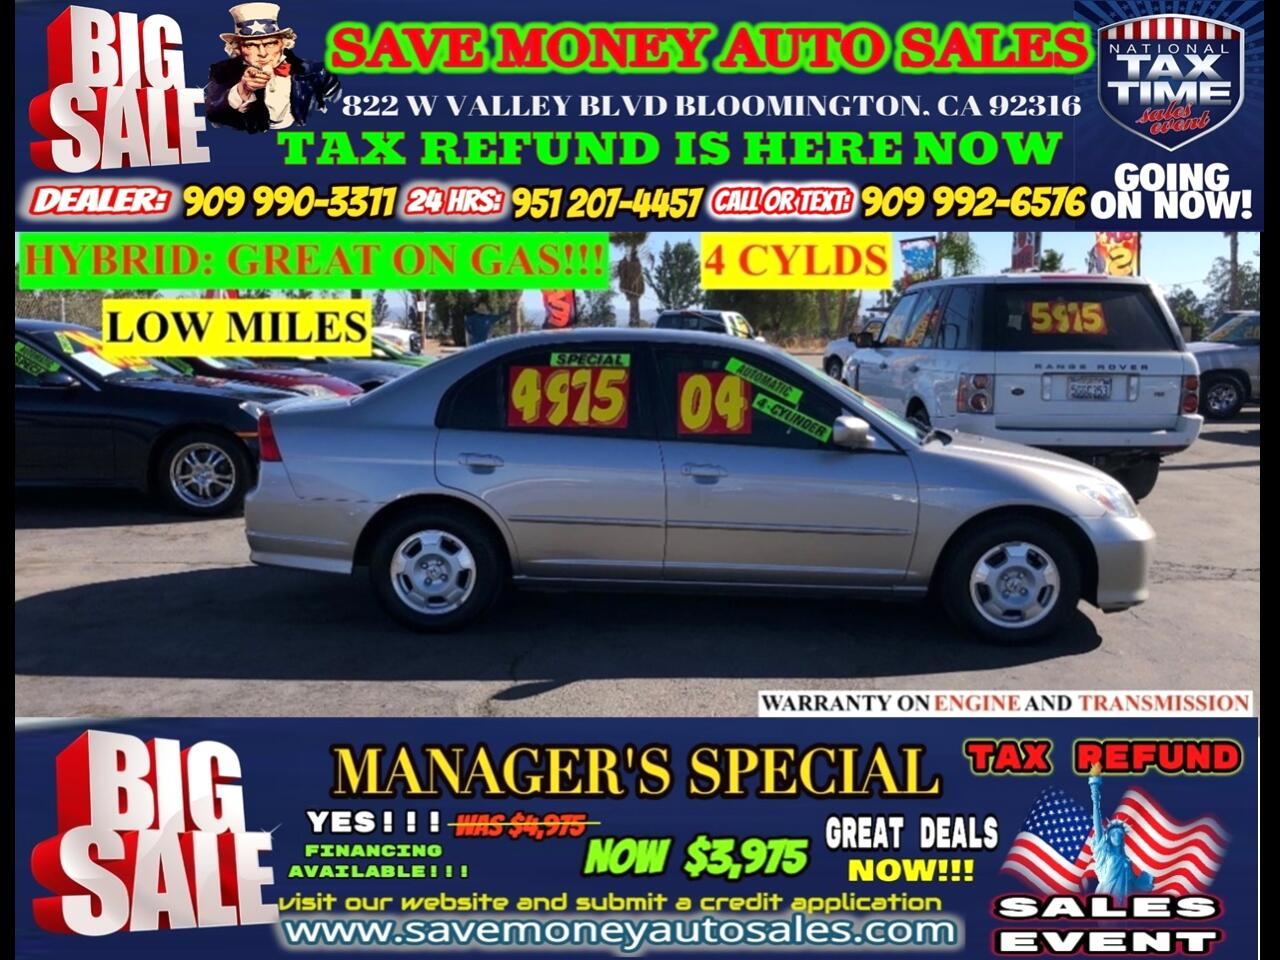 2004 Honda Civic Hybrid SEDAN WITH CVT>>4CYLDS PLUS LOW MILES>>>>